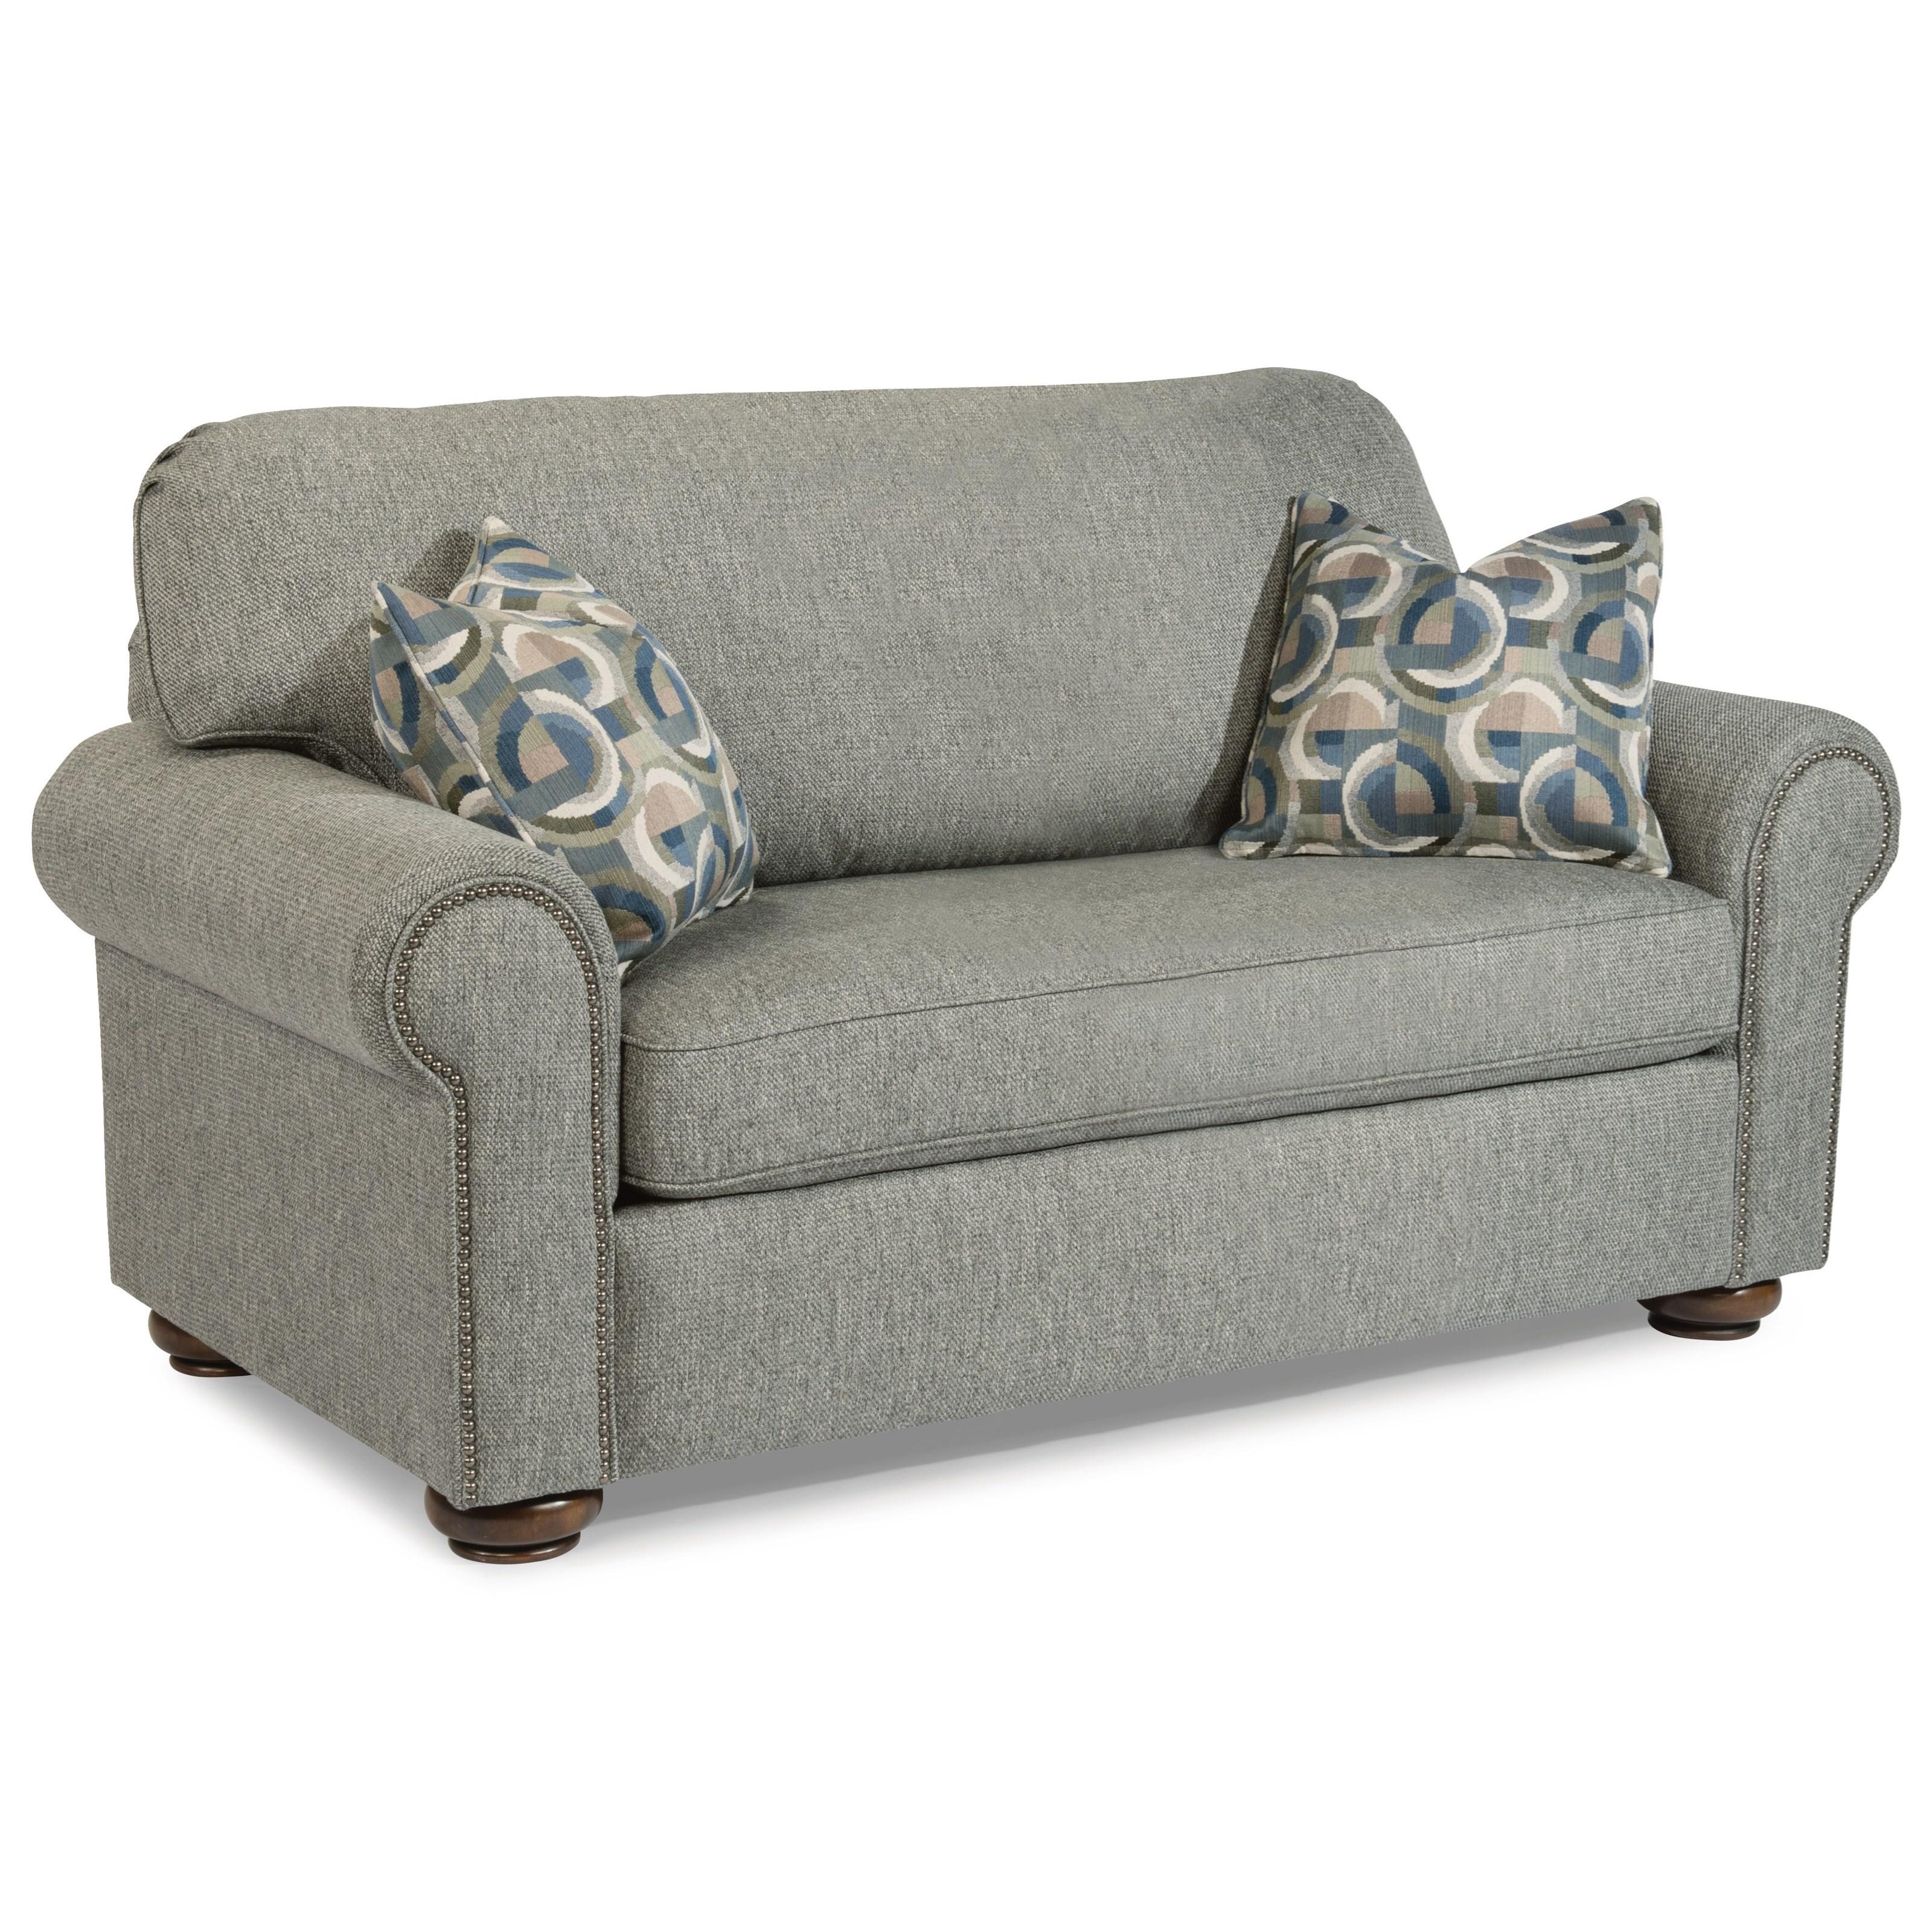 Brilliant Preston Traditional Twin Sleeper Sofa With Nailhead Trim By Flexsteel At Crowley Furniture Mattress Download Free Architecture Designs Ferenbritishbridgeorg